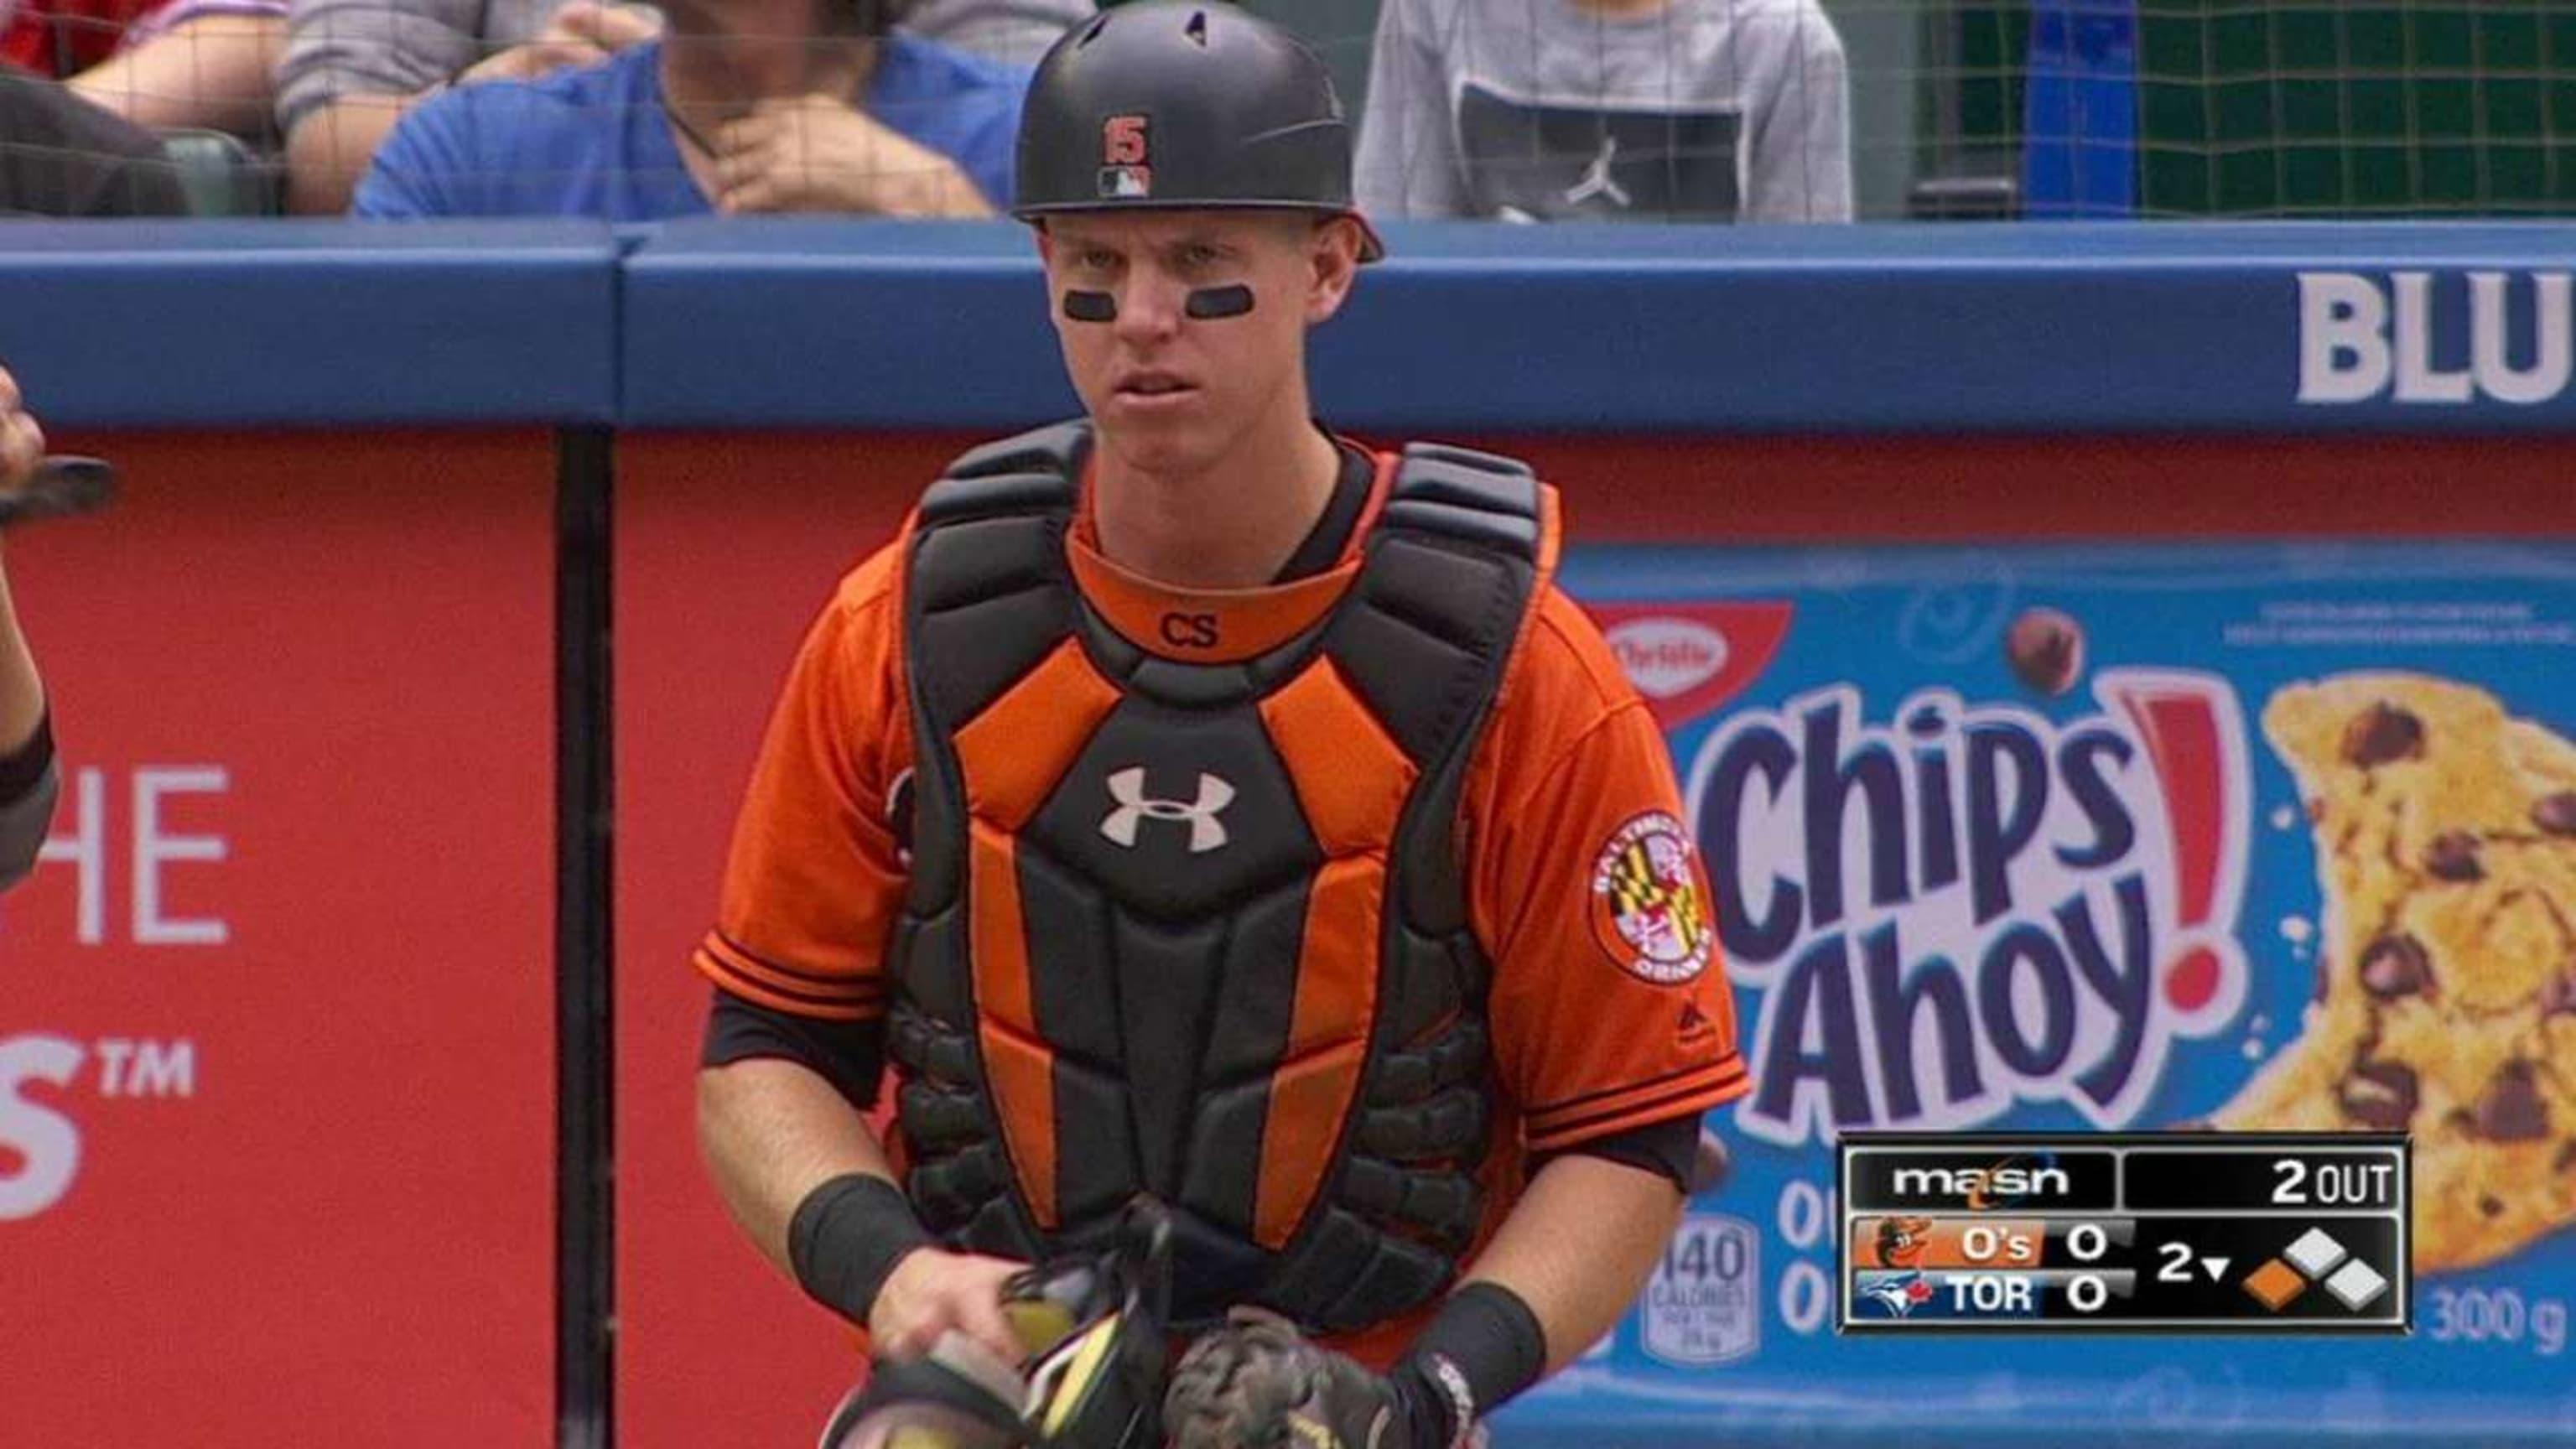 Chance Sisco Baltimore Orioles Baseball Player Jersey